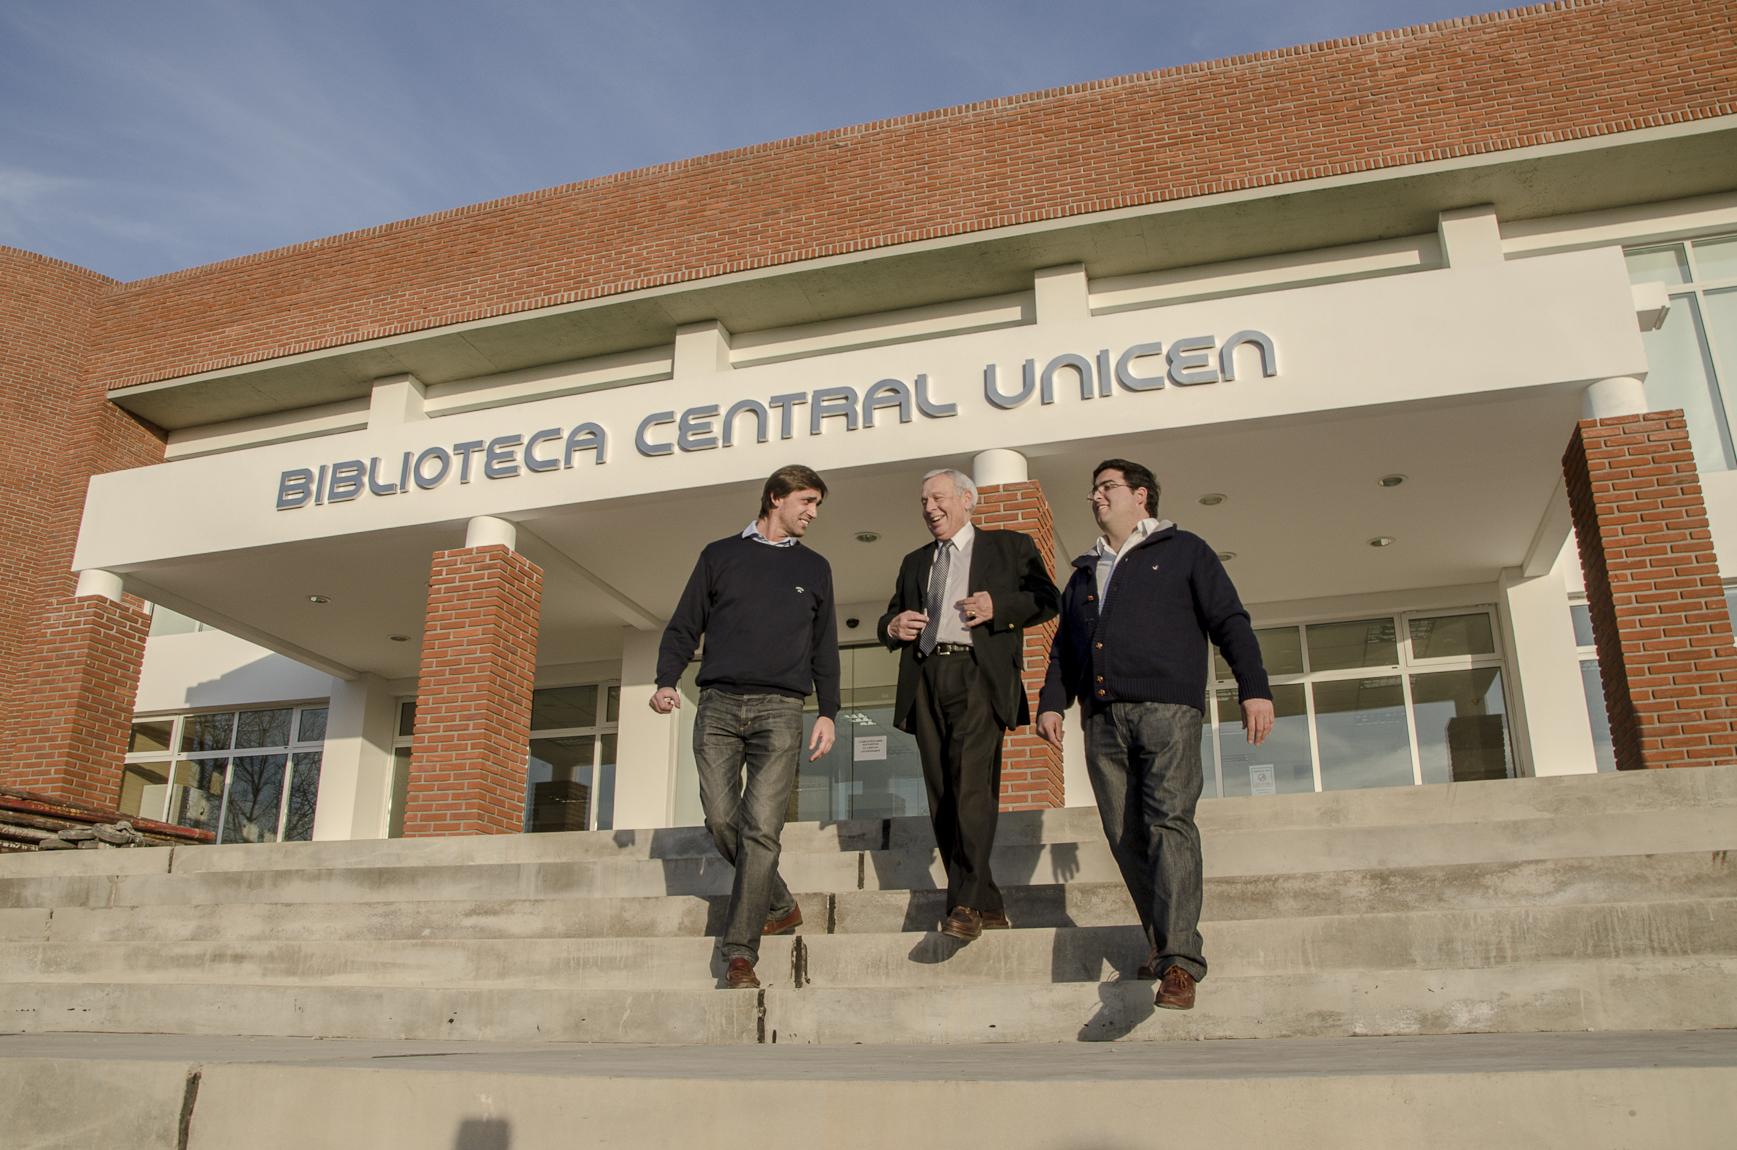 Biblioteca Central UNICEN